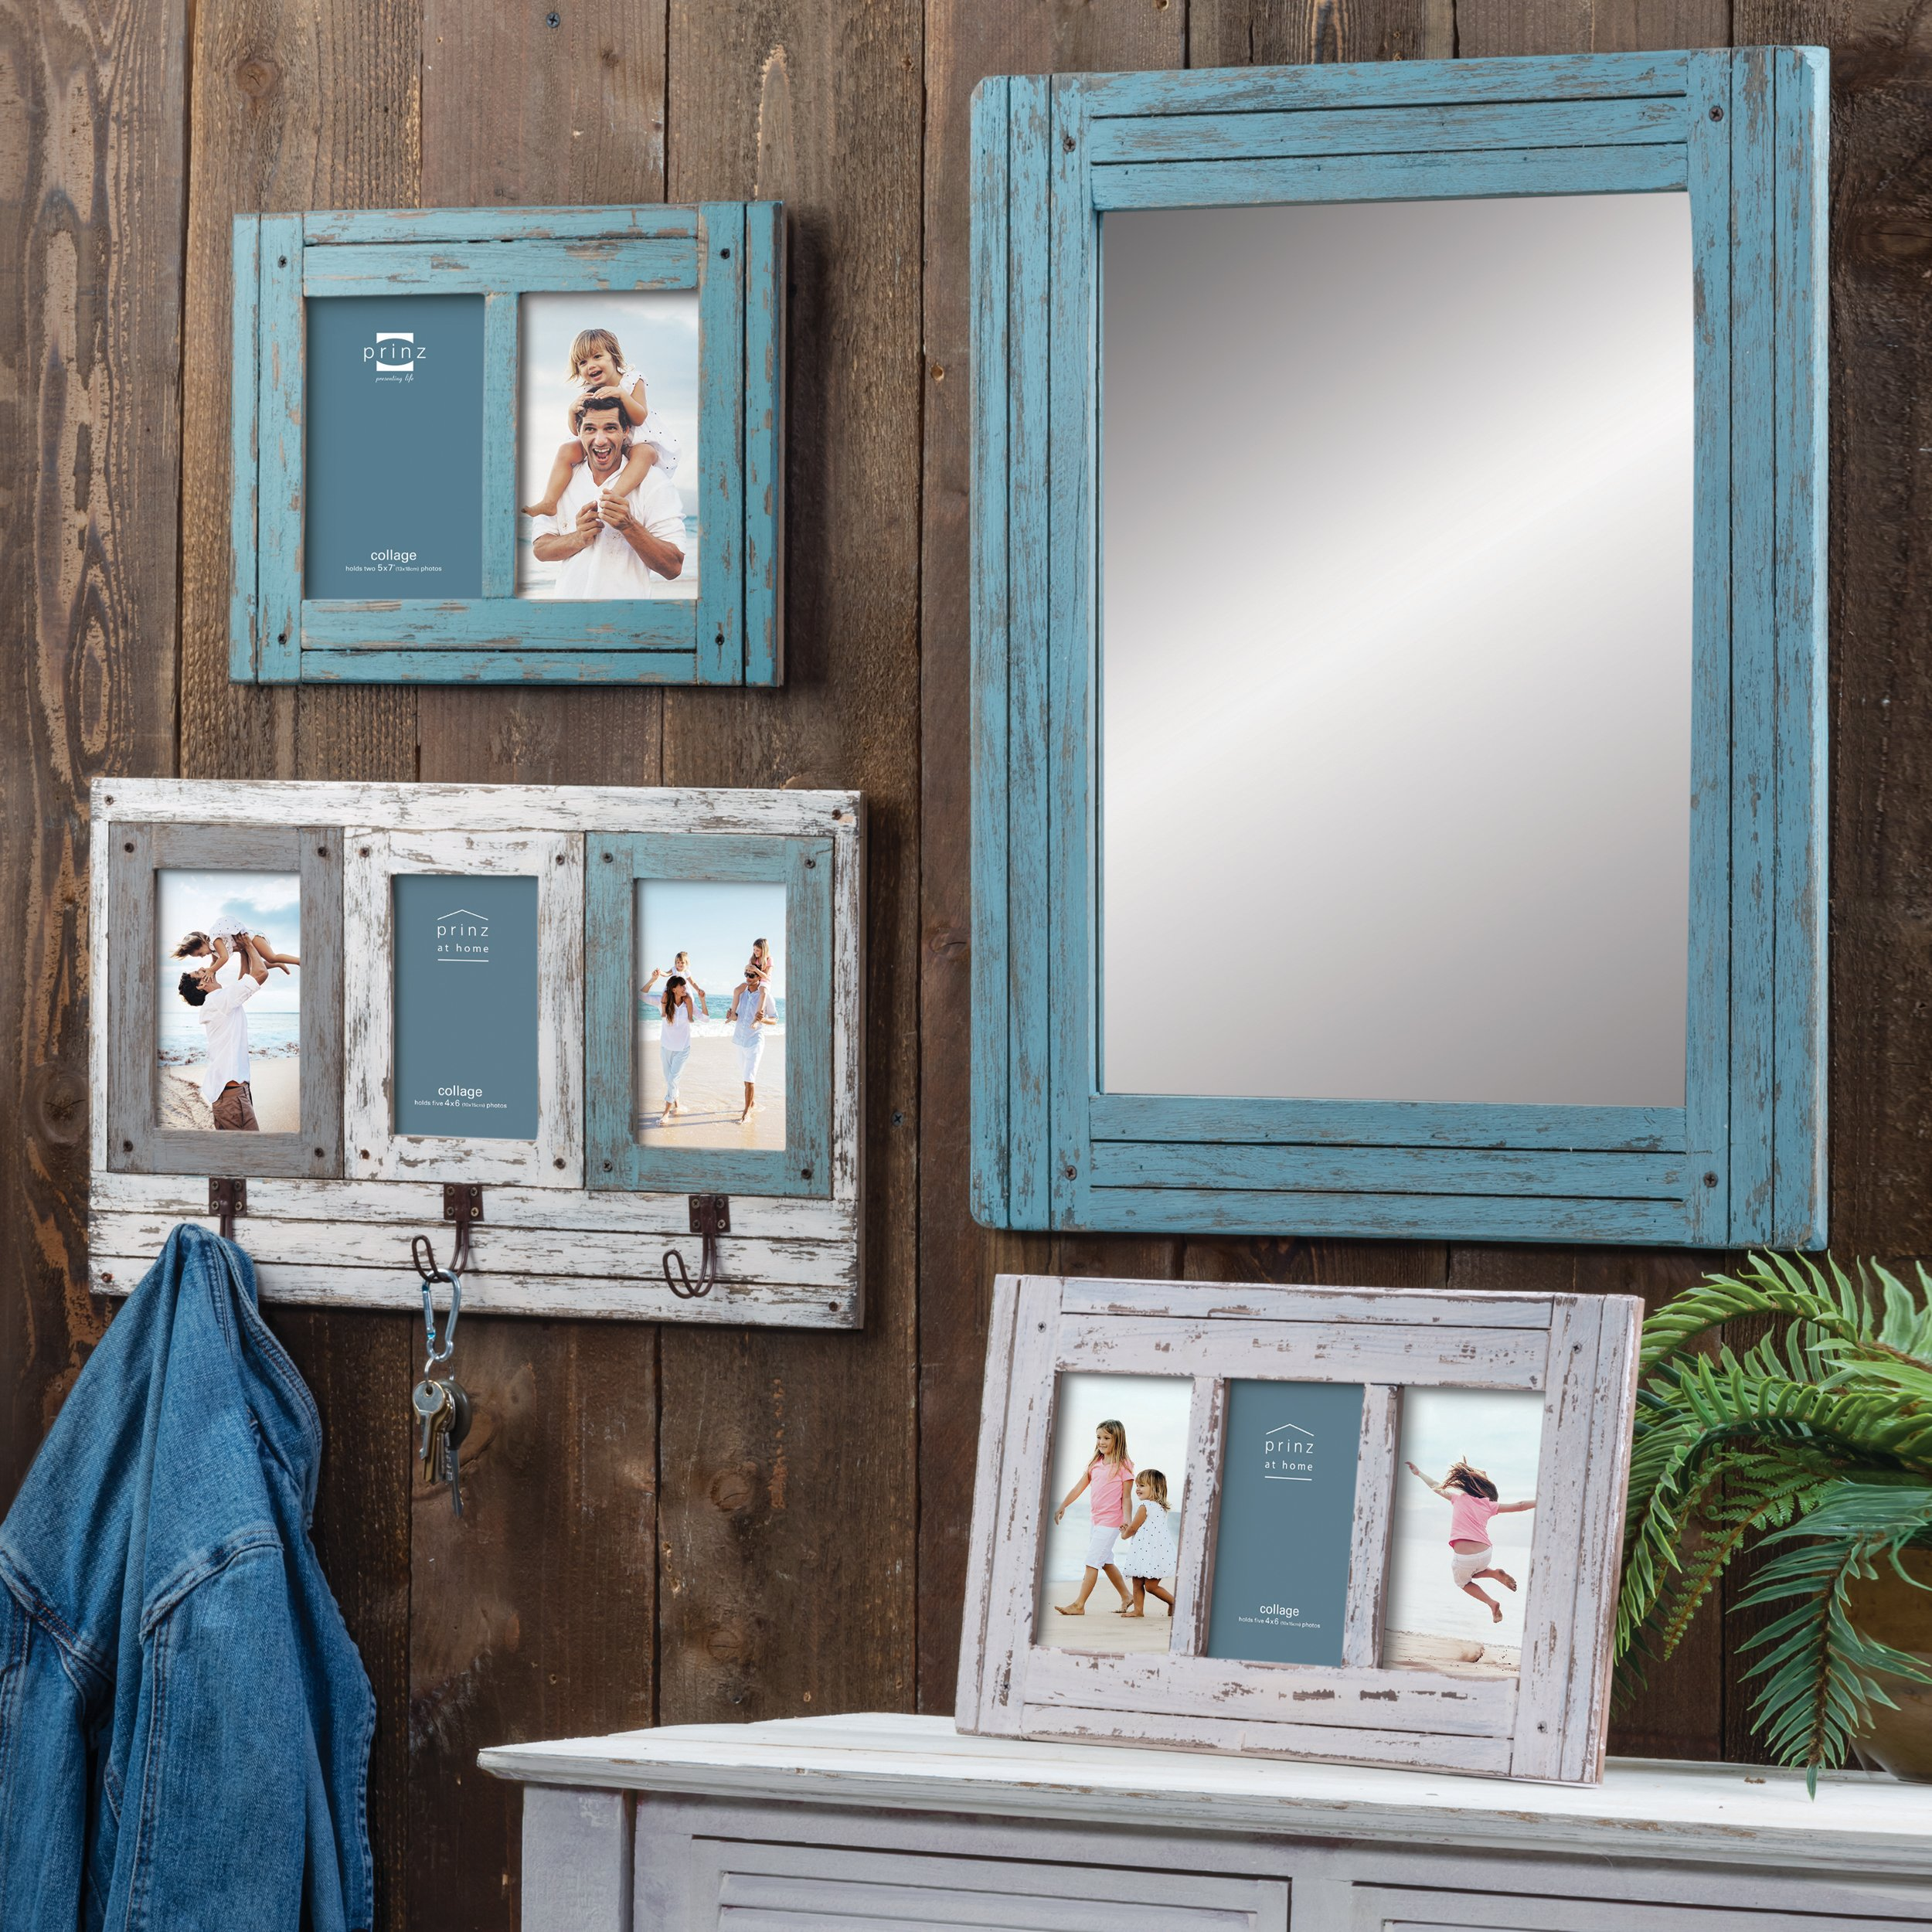 Prinz 18.5'' x 23.5'' Blue Water's Edge Homestead Mirror Distressed Wood by PRINZ (Image #2)